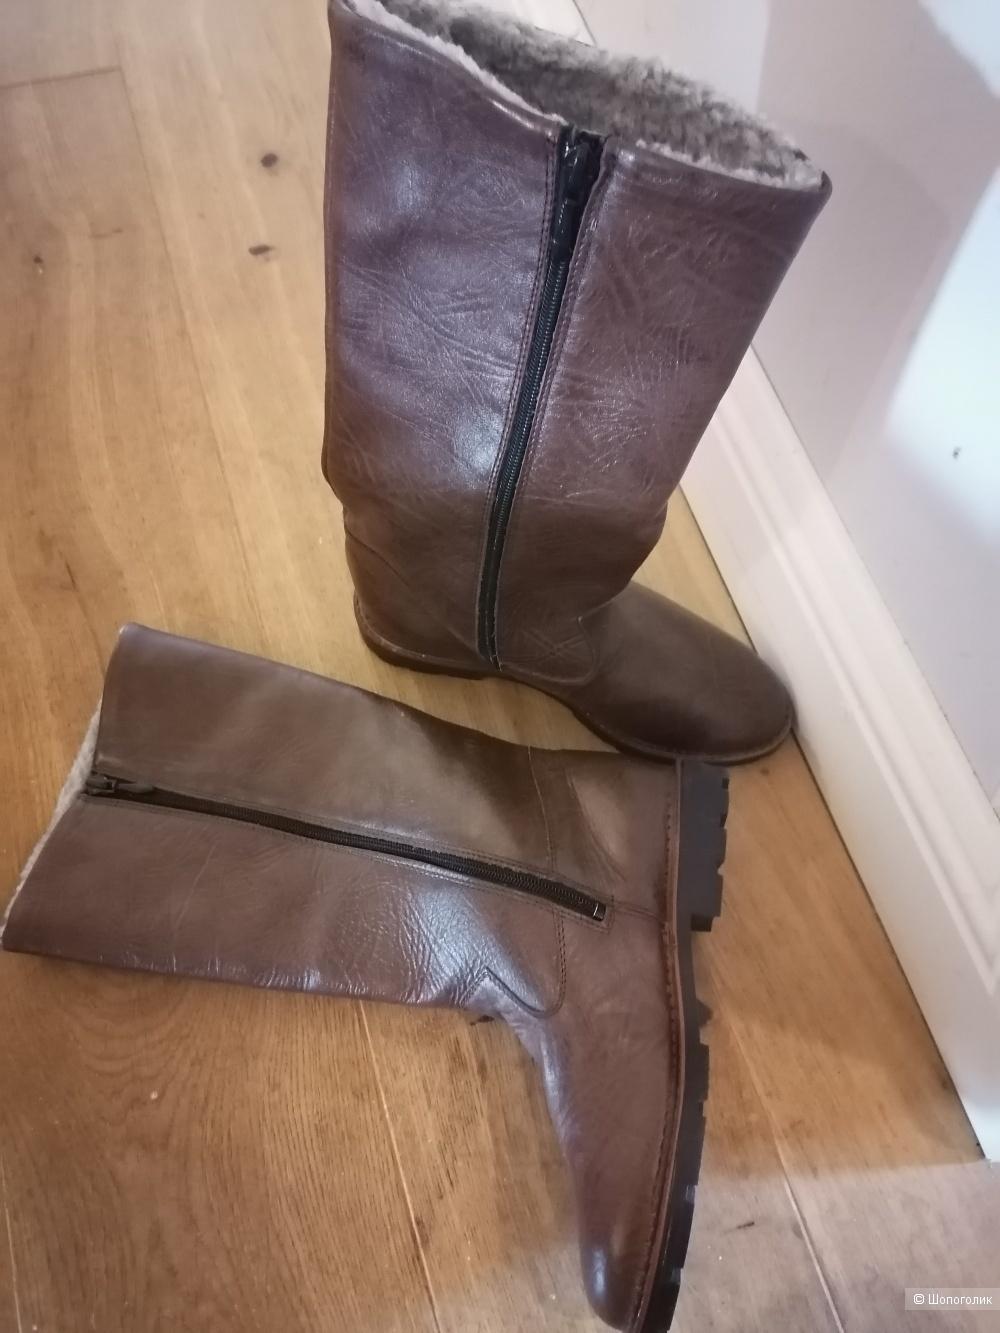 Кожаные сапоги на меху Centrotextil размер 37,5